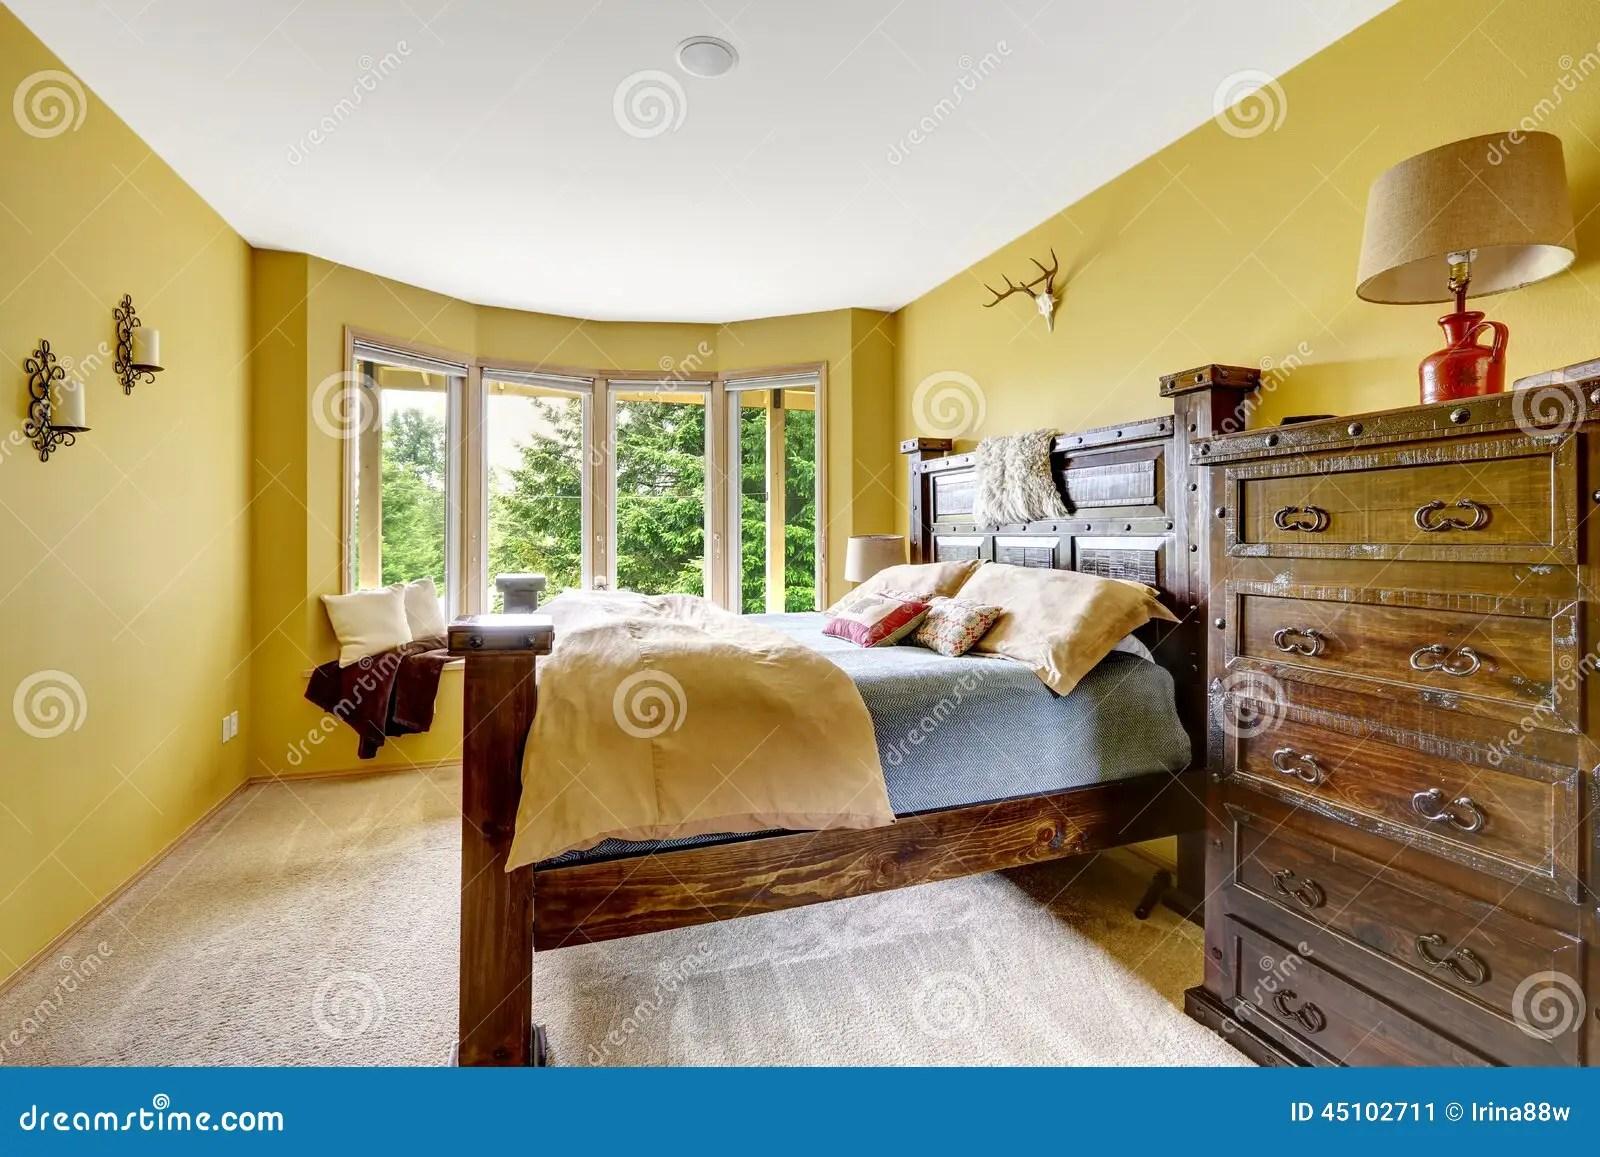 Farm House Interior Luxury Bedroom Interior With Rich